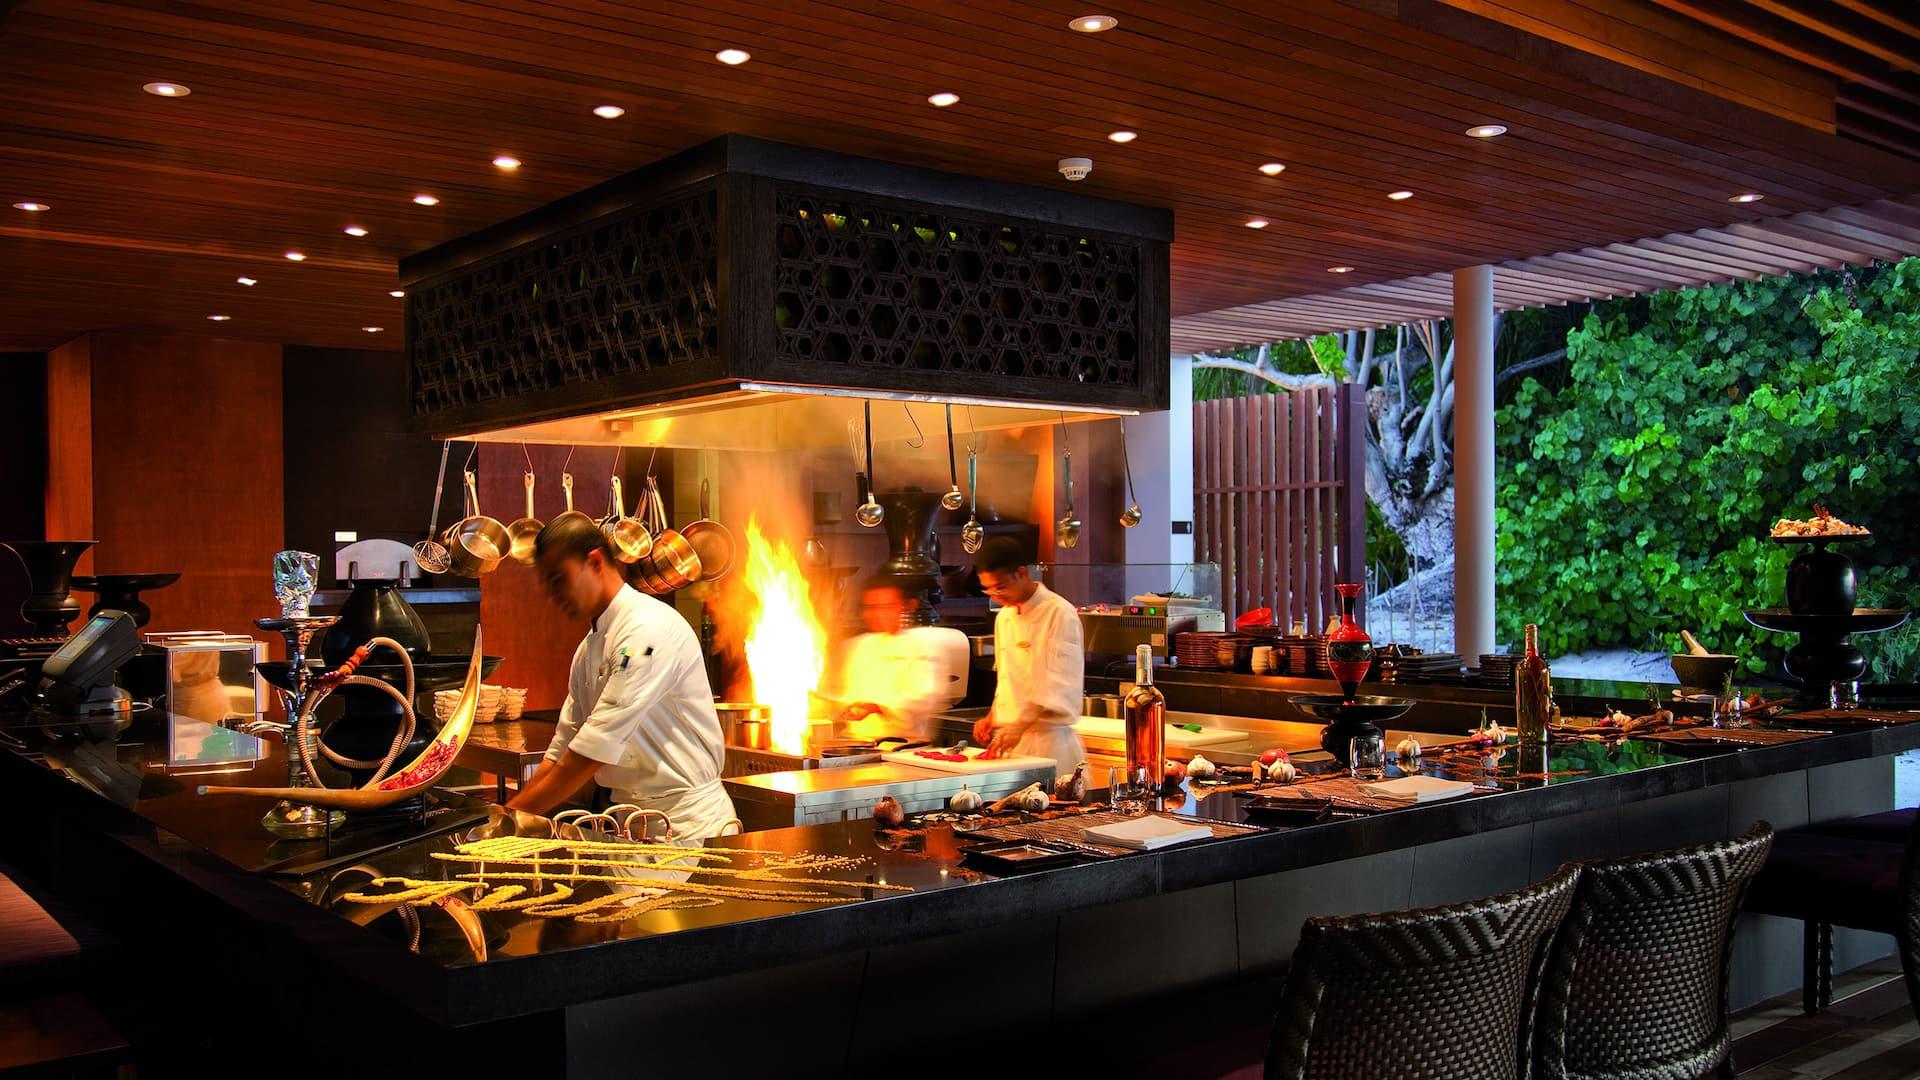 Luxury Maldives resort seafood restaurant island grill